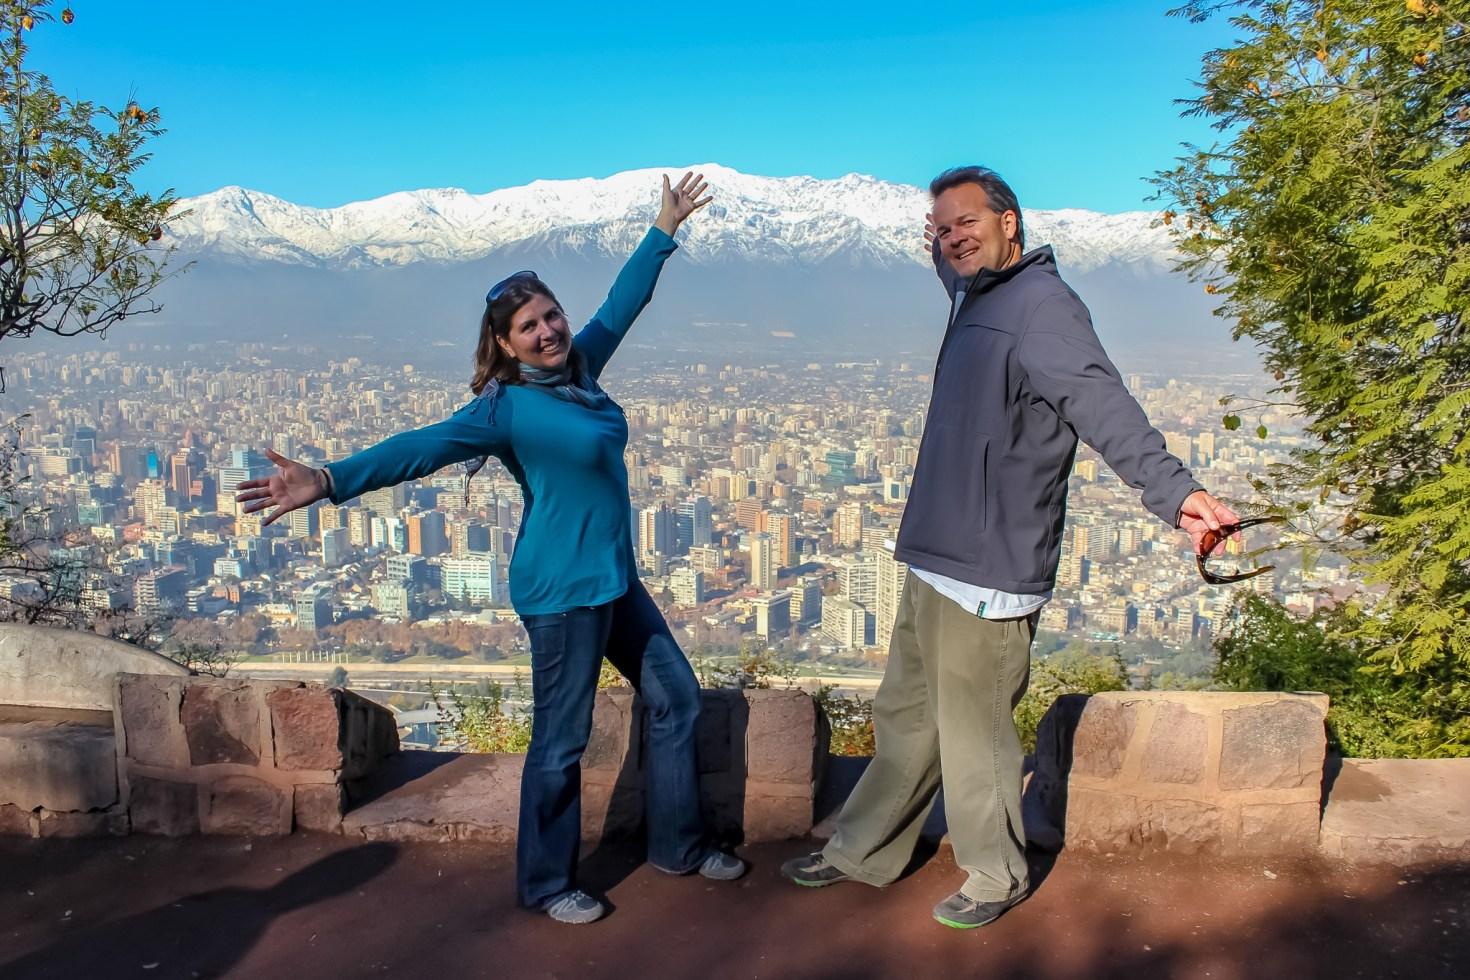 Cerro Cristobal, Santiago, Chile